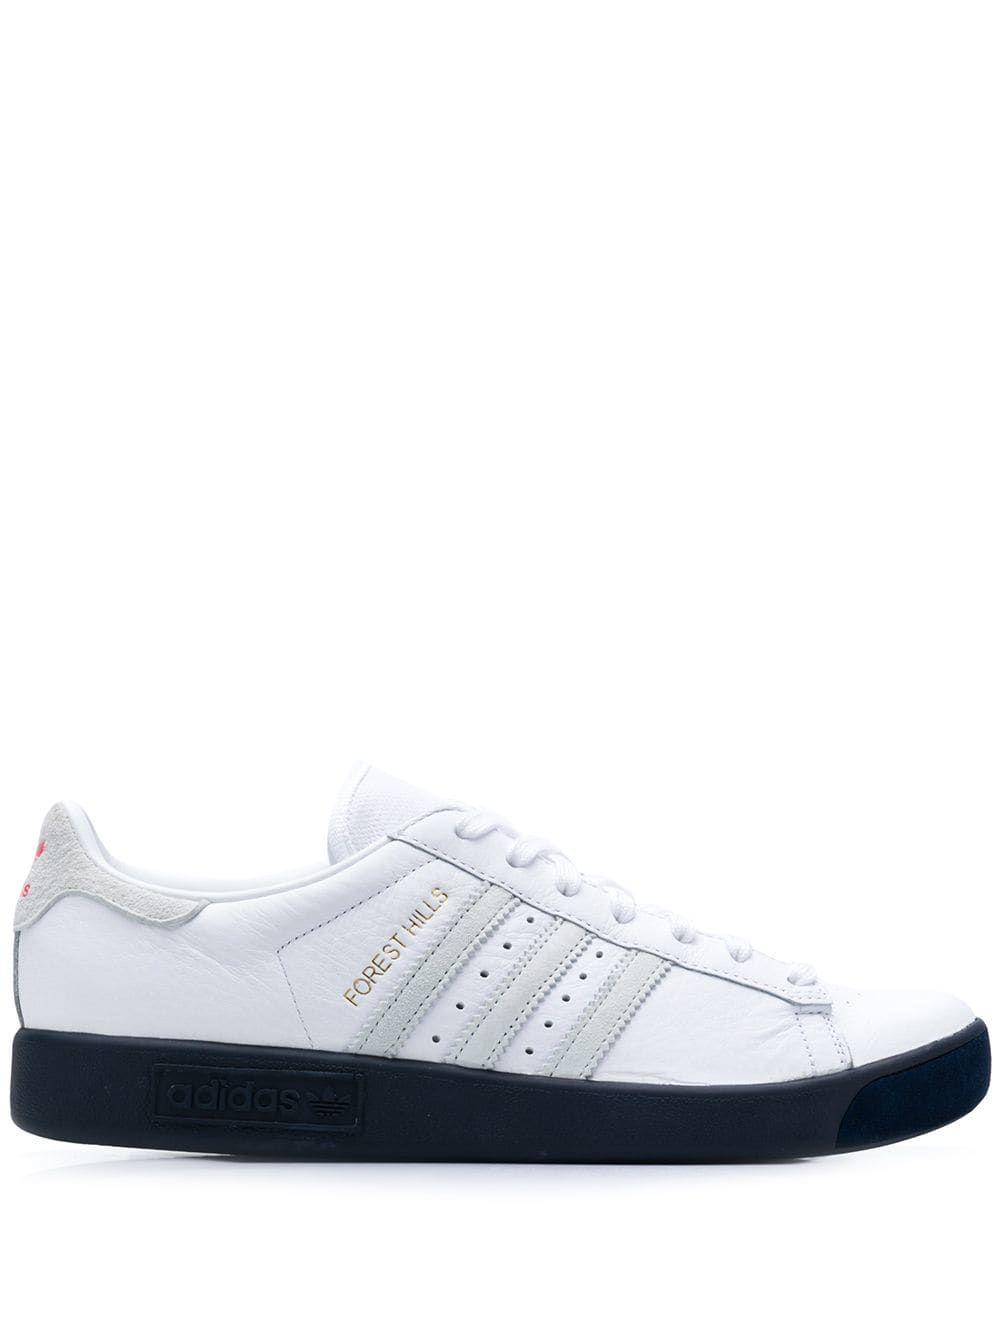 Adidas Originals Forest Hills Sneakers